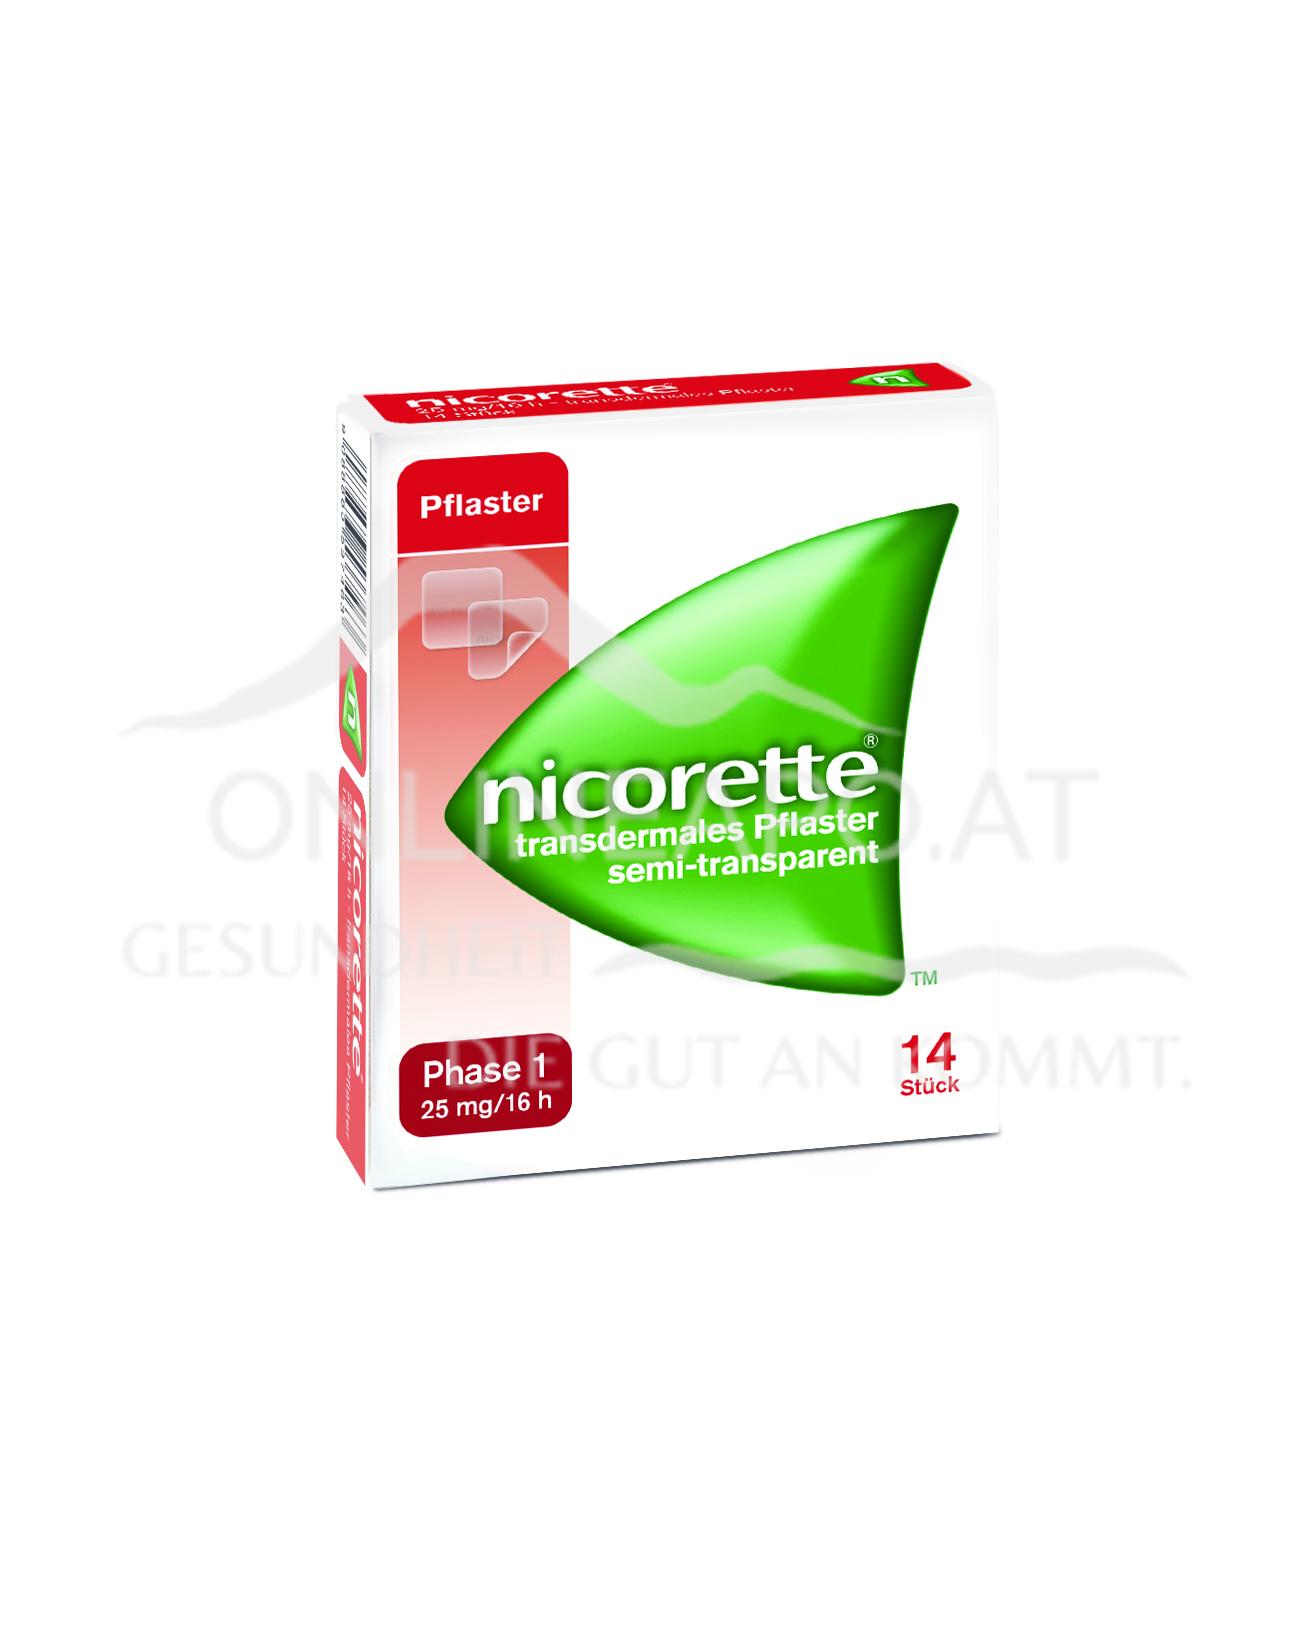 Nicorette® Transdermales Pflaster 25mg/16h